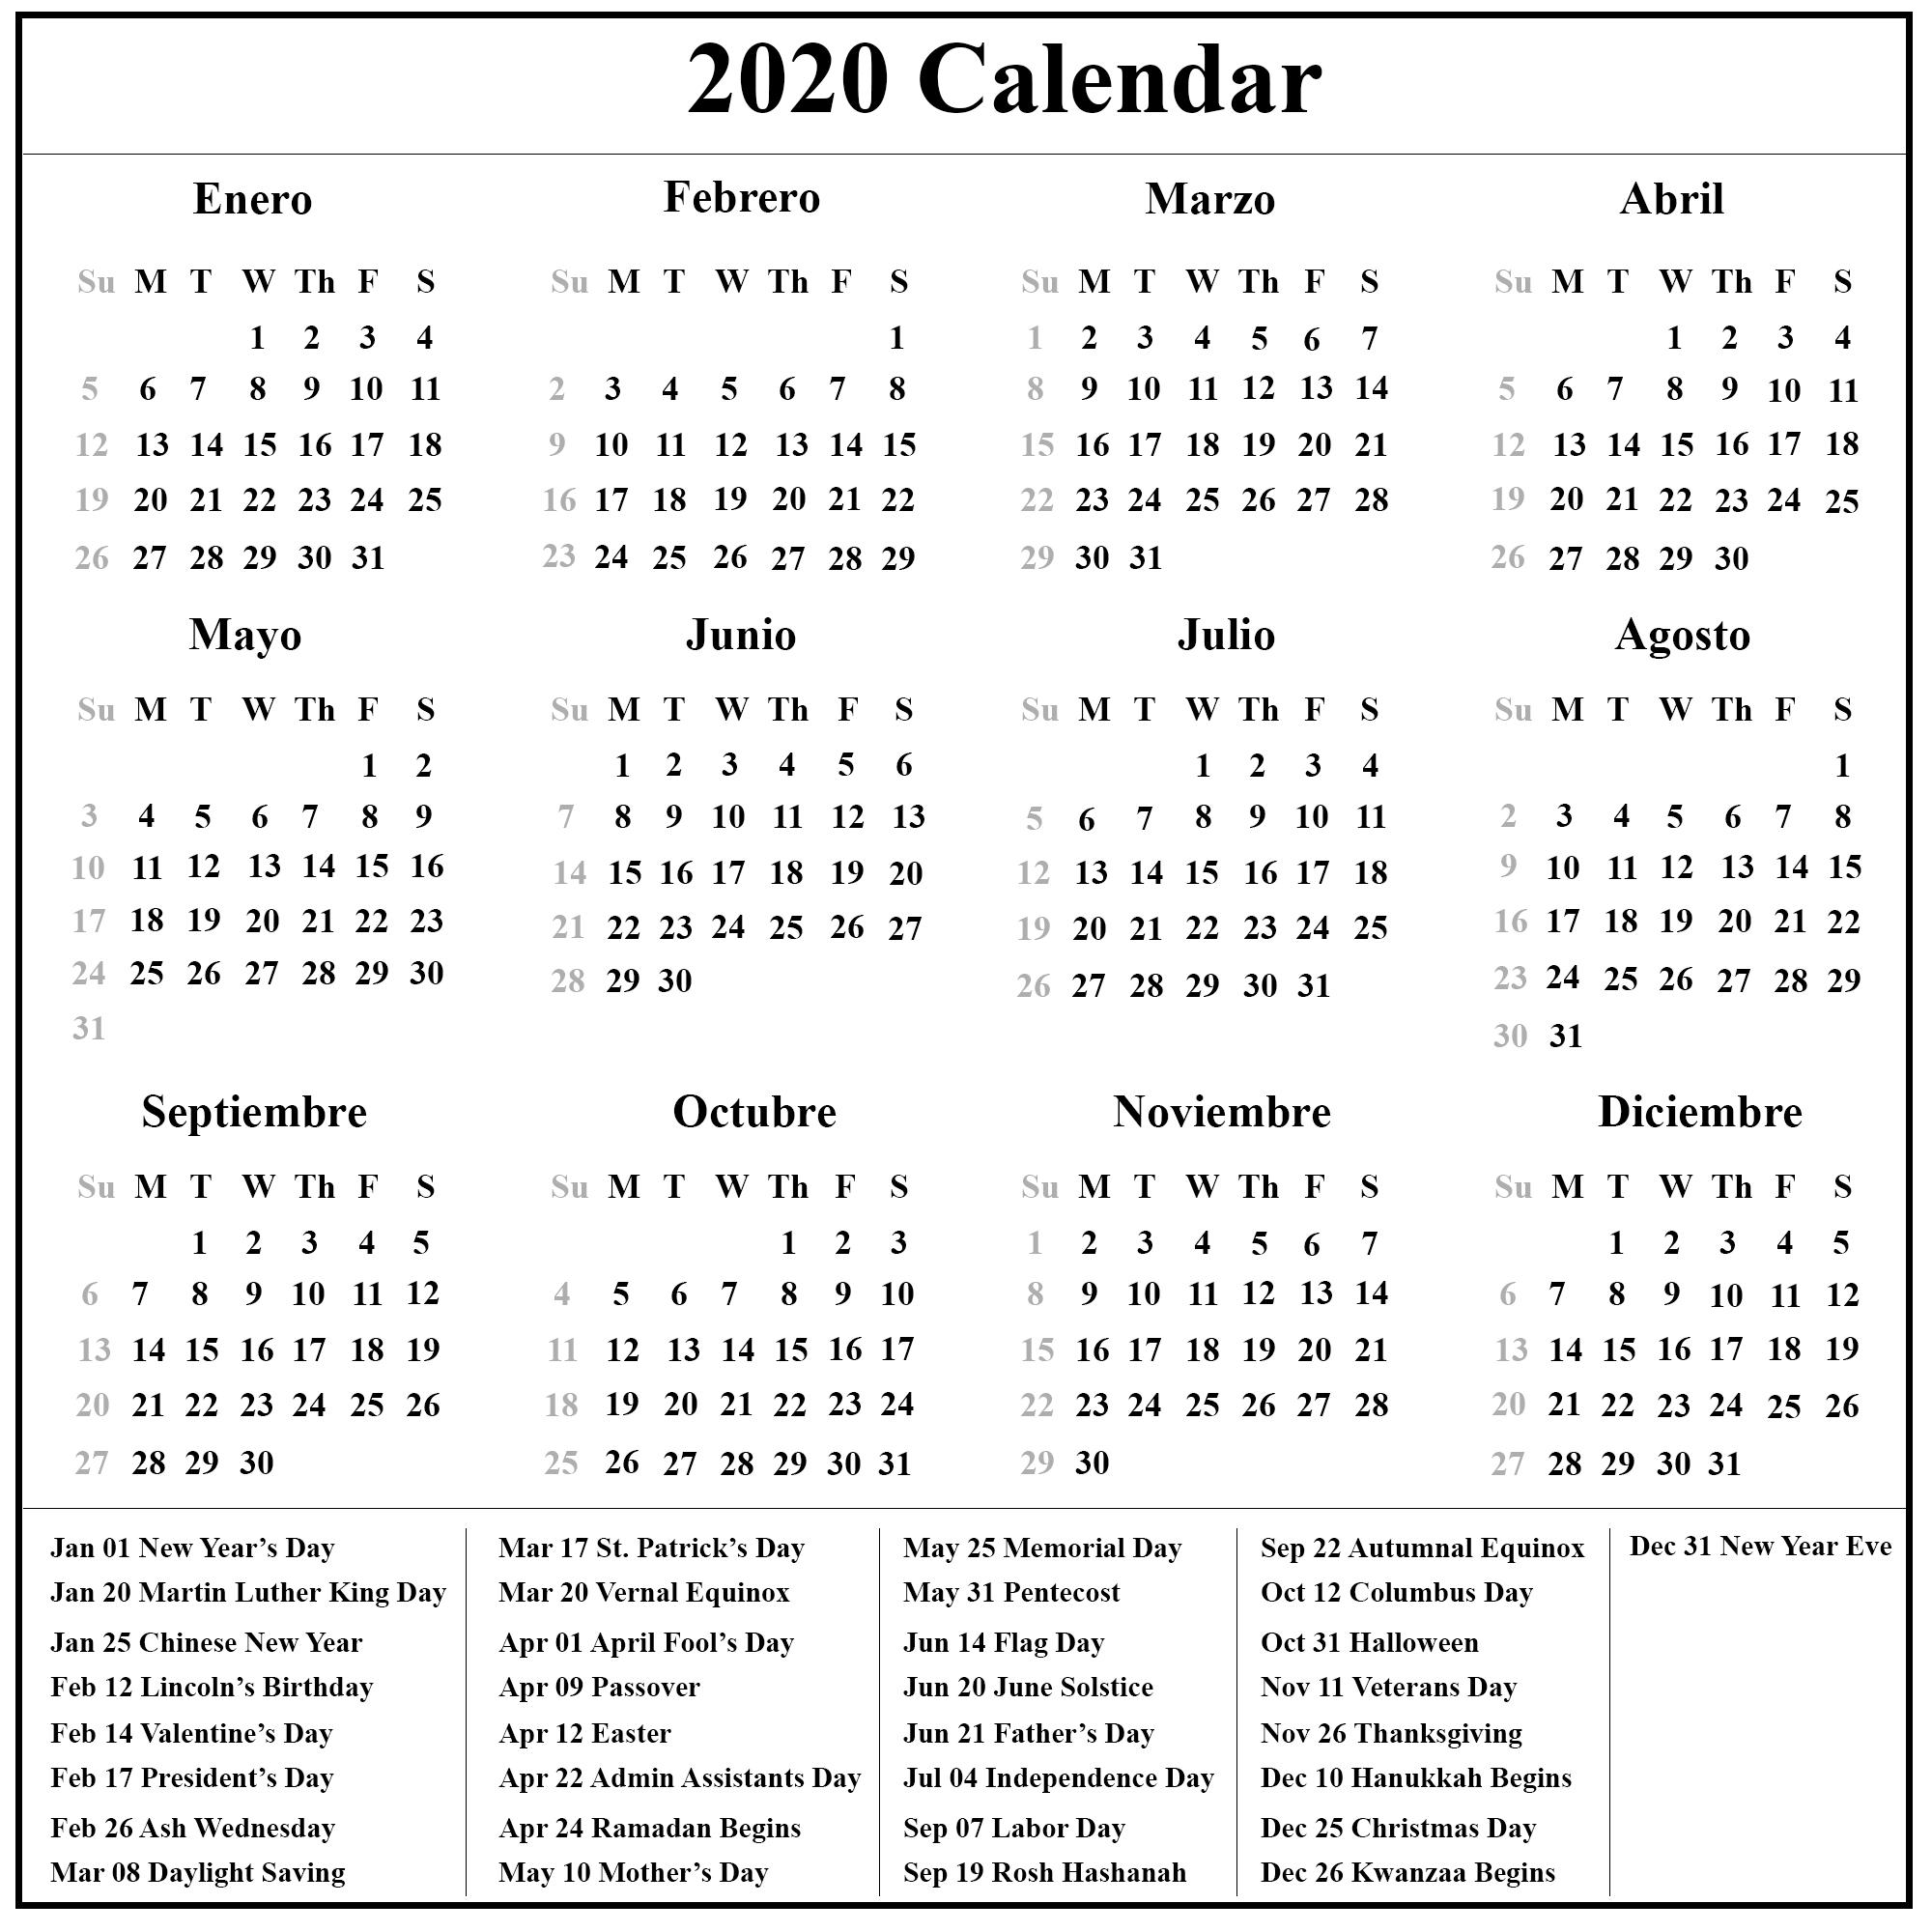 Spanish Calendar 2020| 2020 Calendario | Calendar Top-Europe Holidays 2020 Calendar